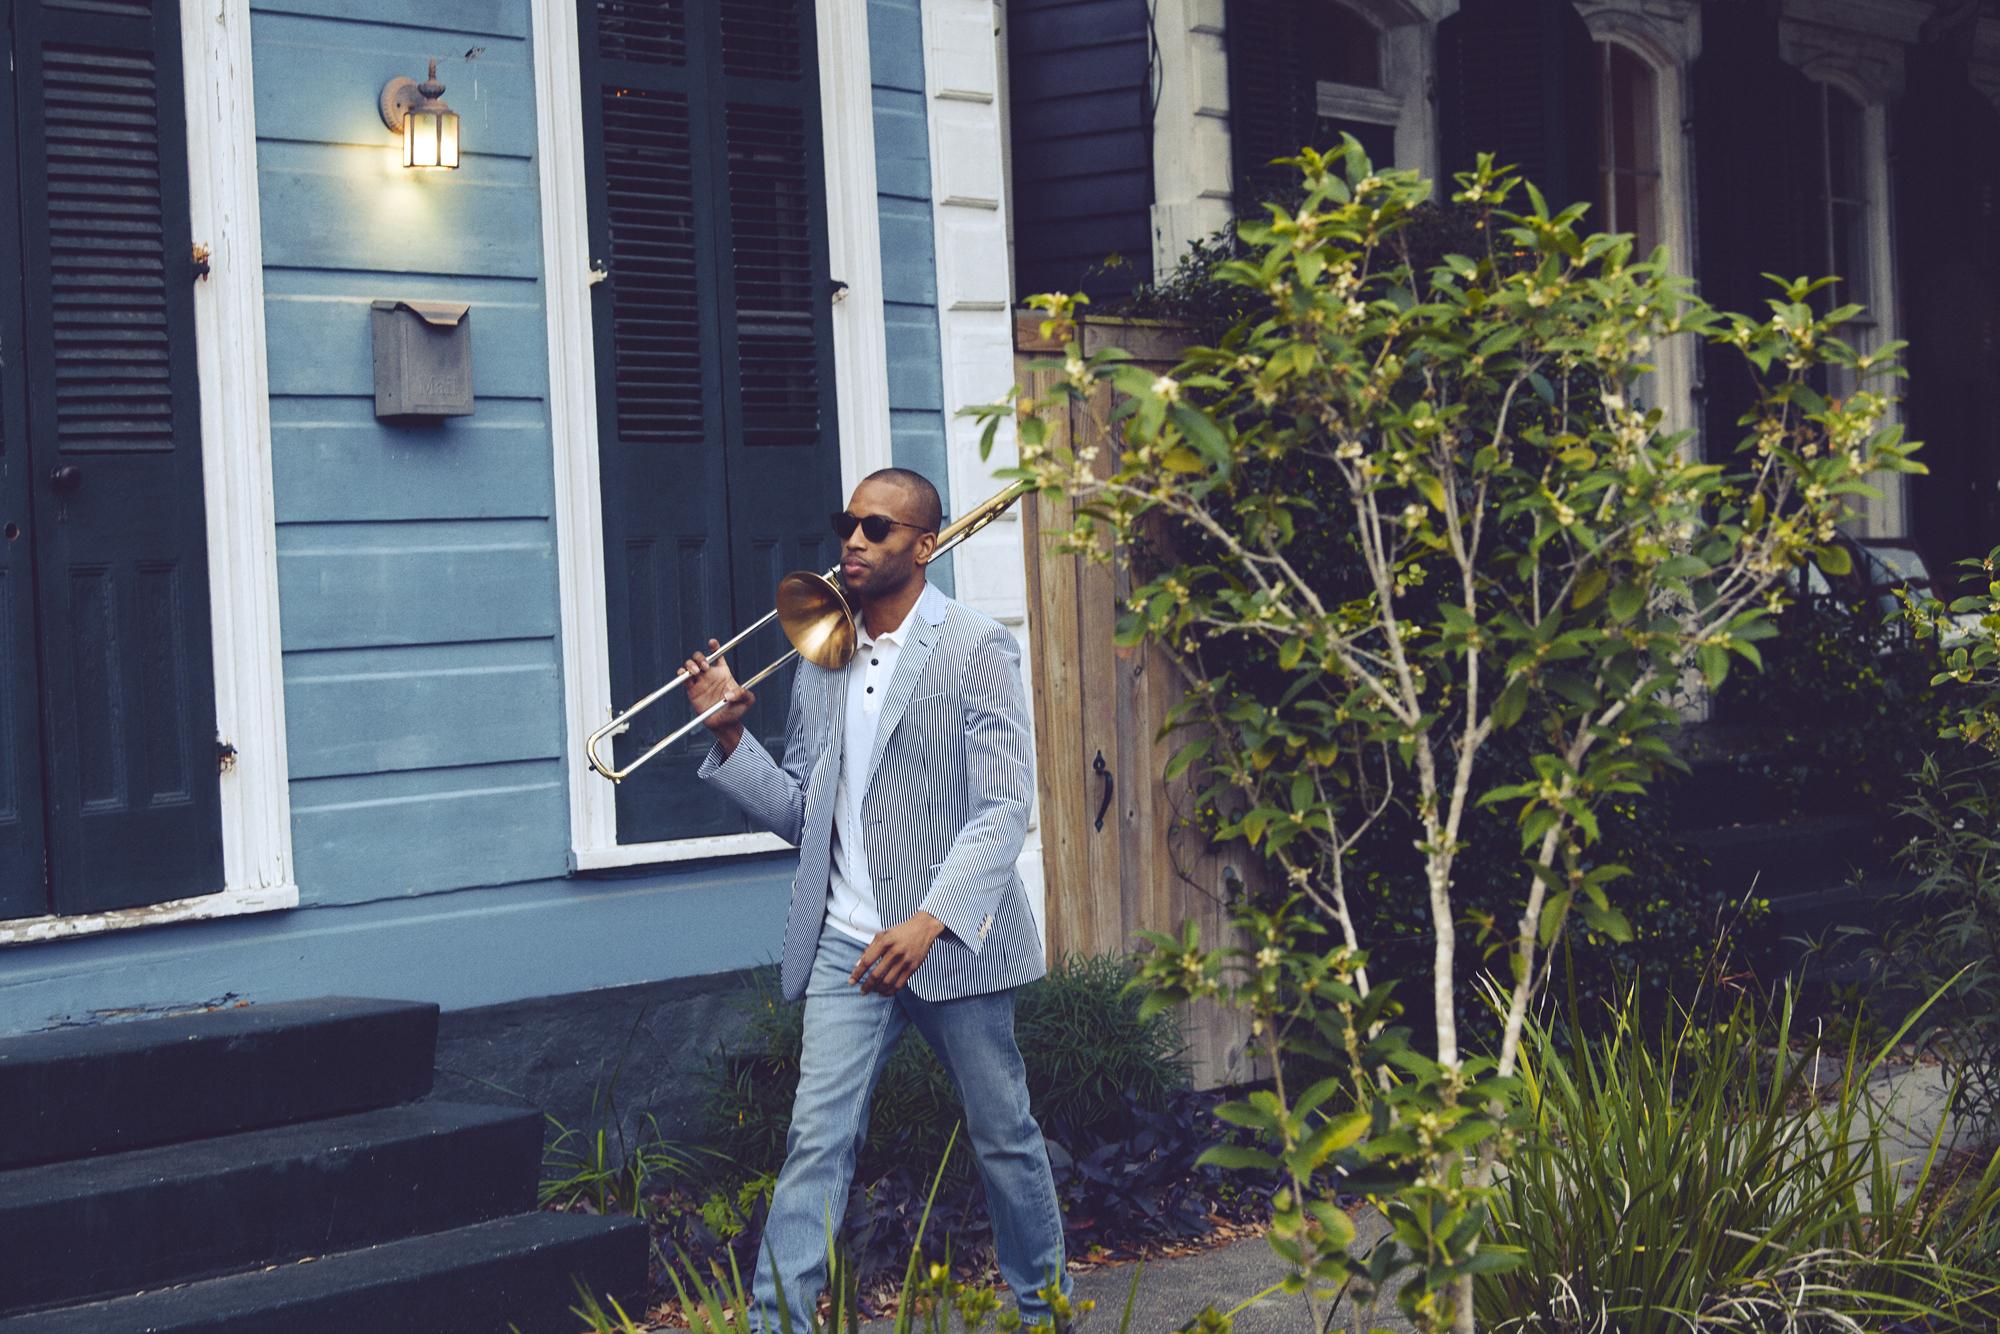 Trombone Shorty strolling through Treme wearing Salvatore Ferragamo, Rag & Bone, and BOSS